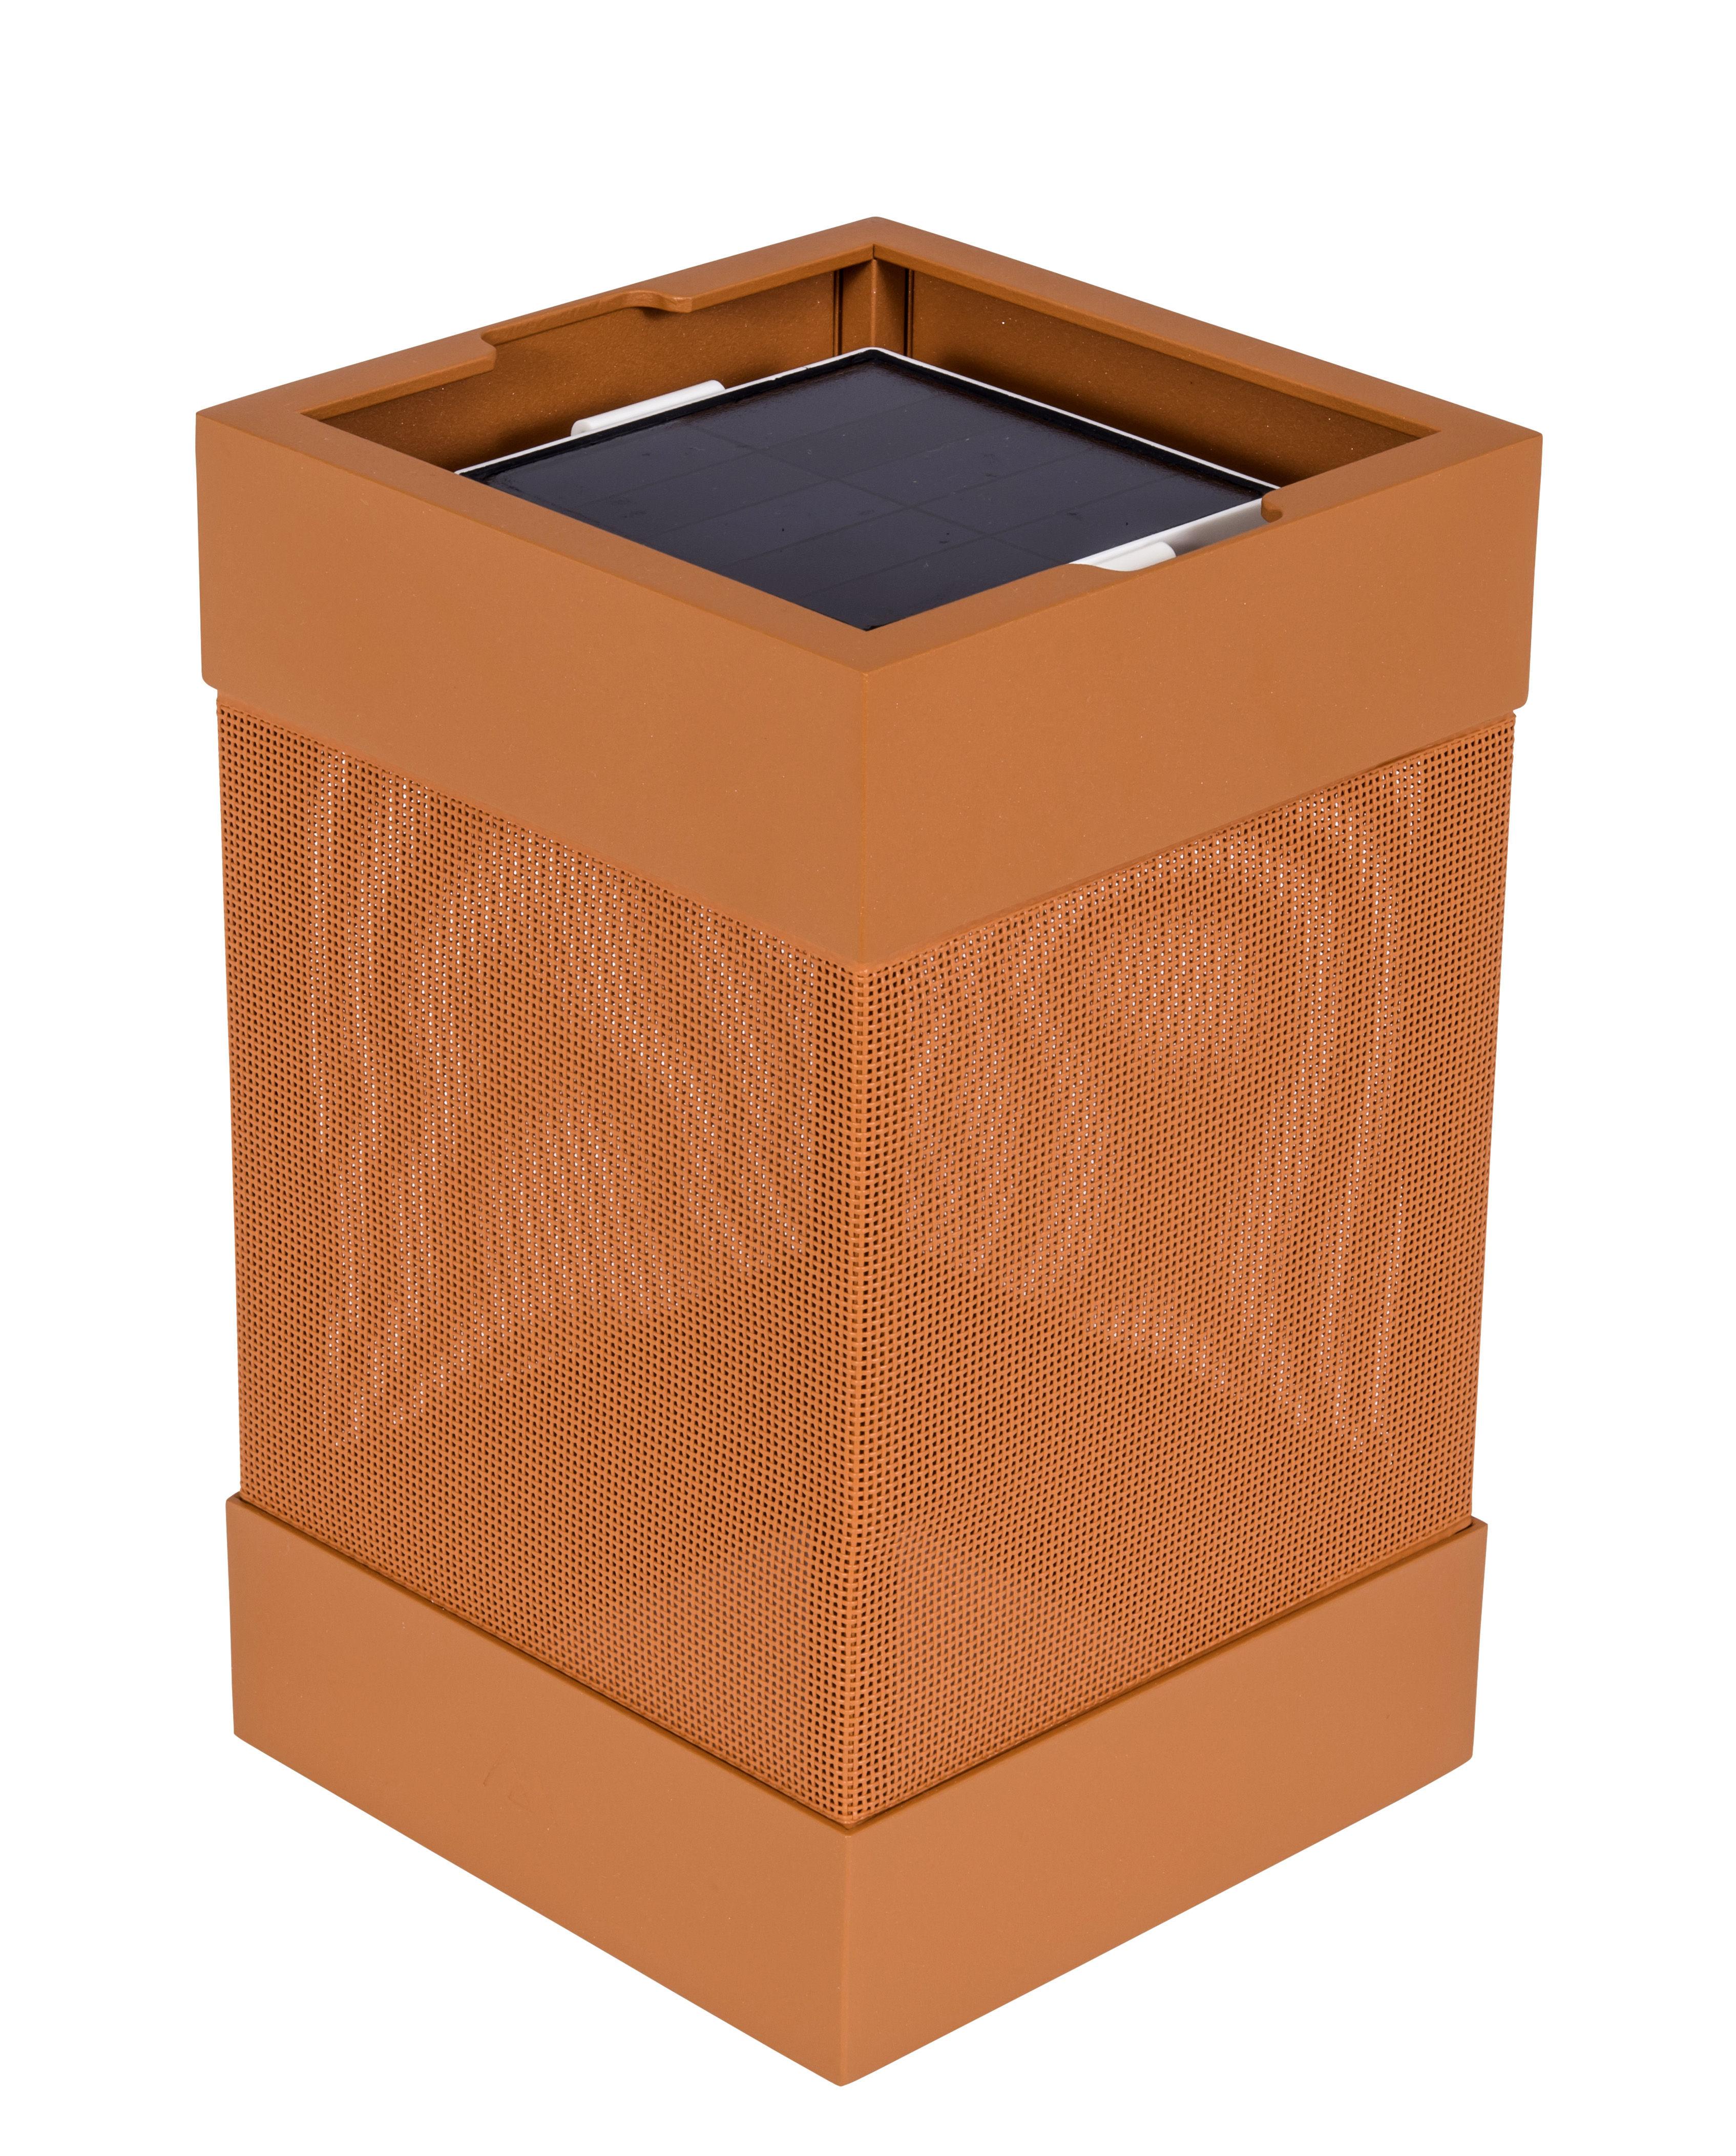 lampe solaire la lampe pose 03 led sans fil safran maiori. Black Bedroom Furniture Sets. Home Design Ideas